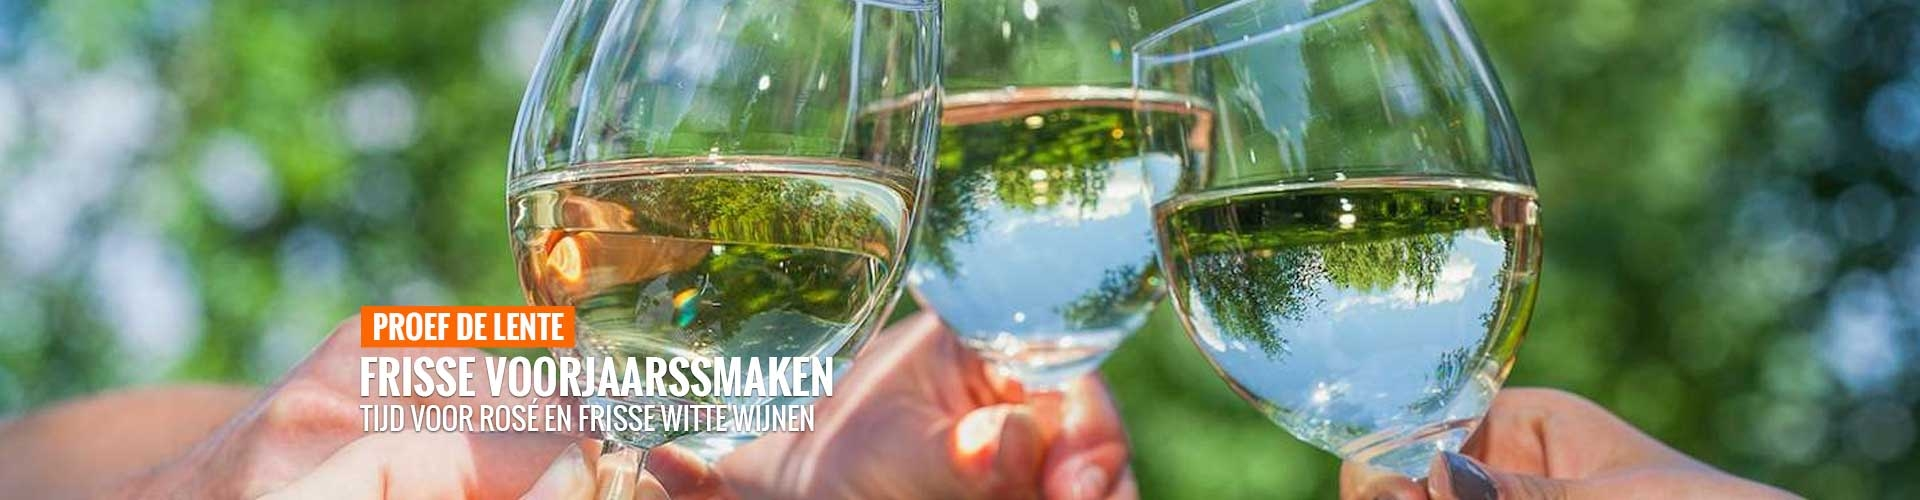 Proef de lente wijnen